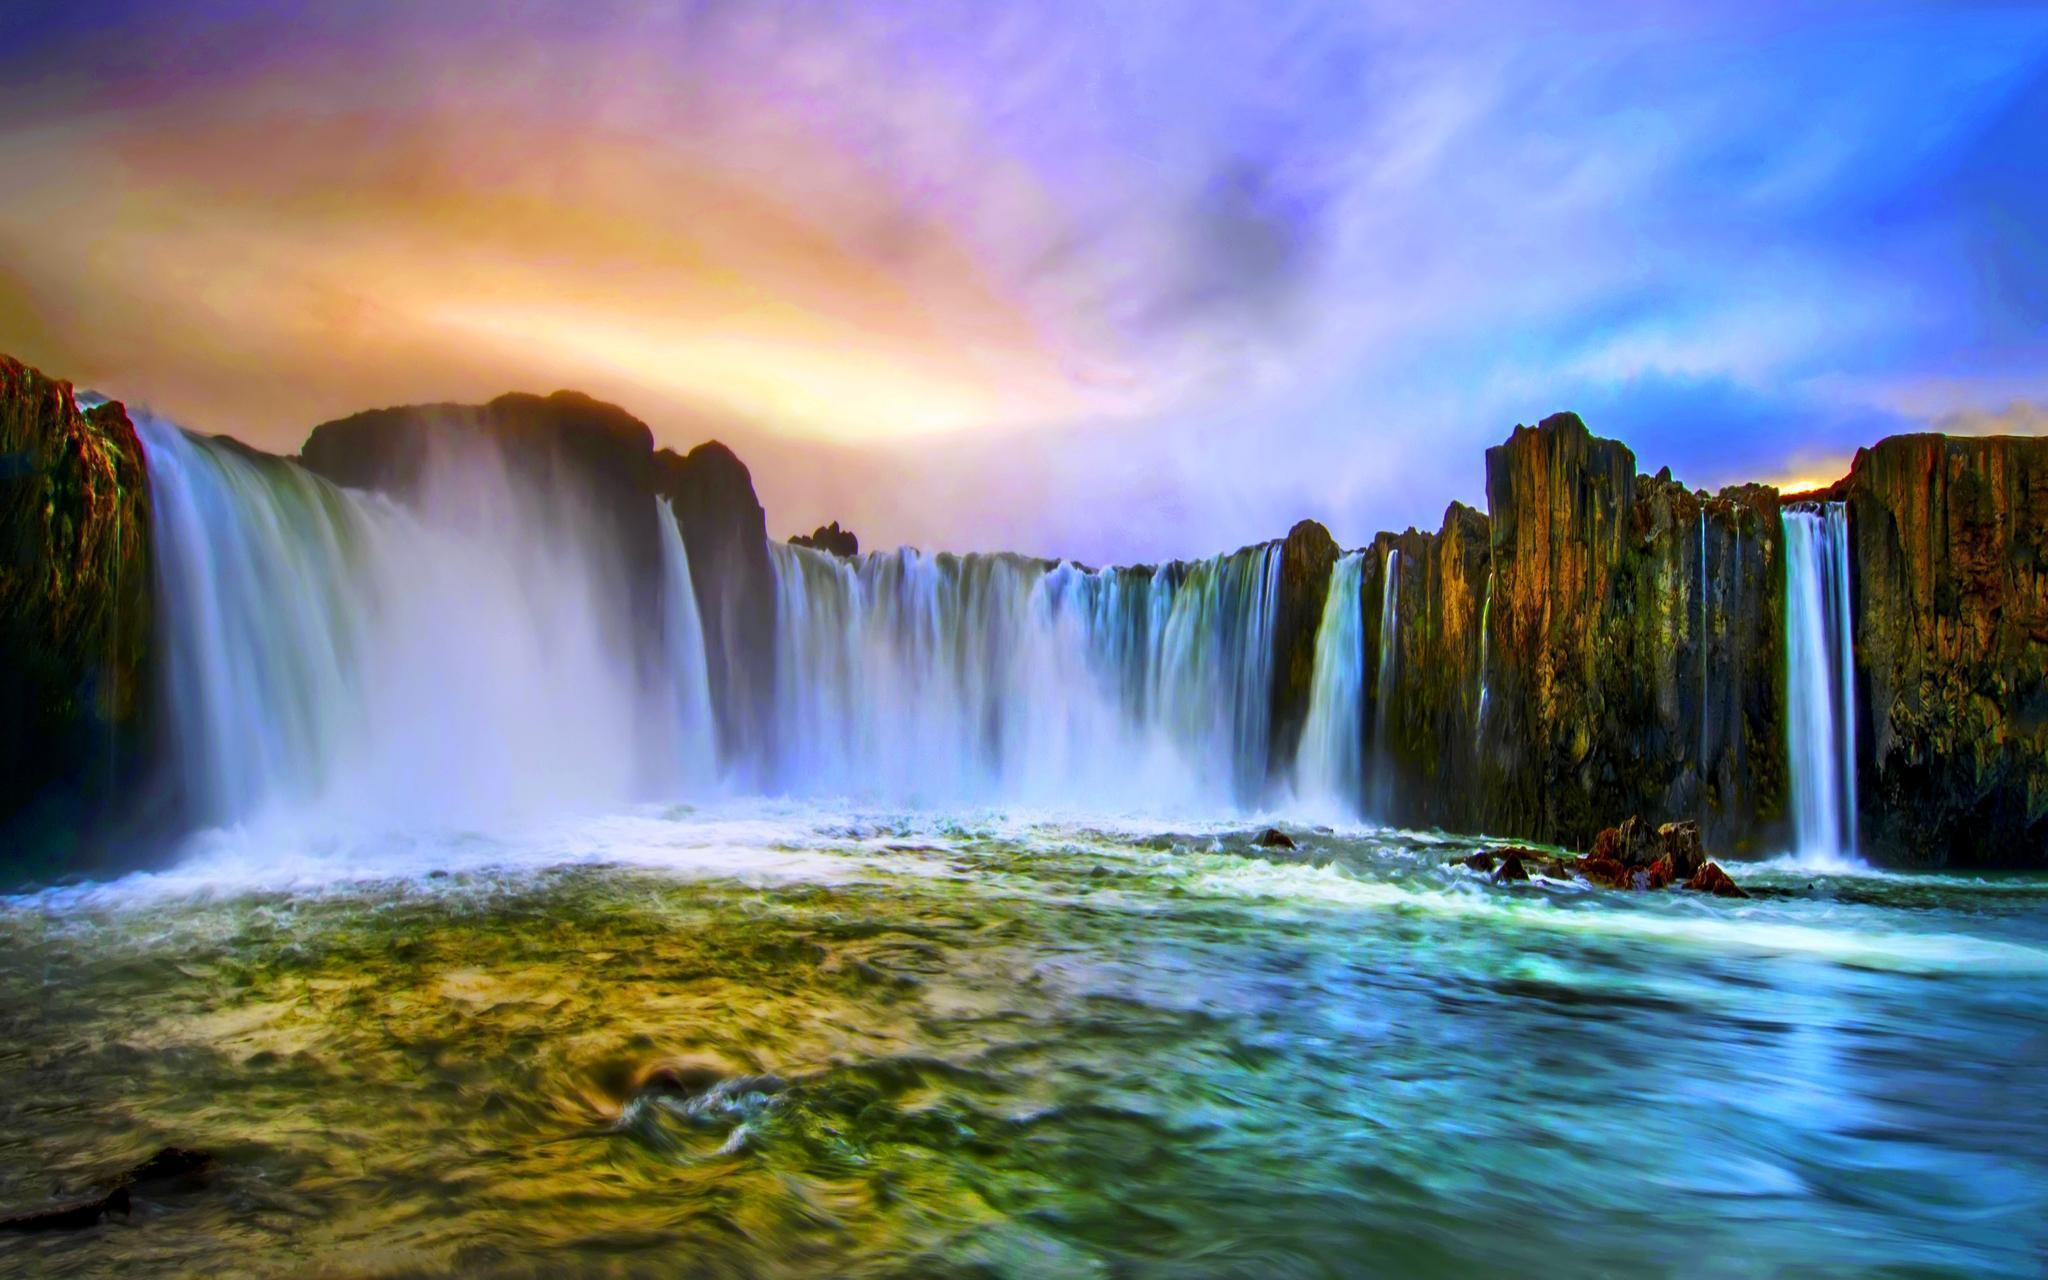 Niagara Falls Hd 1080p Wallpapers Water Falls Wallpapers Wallpaper Cave